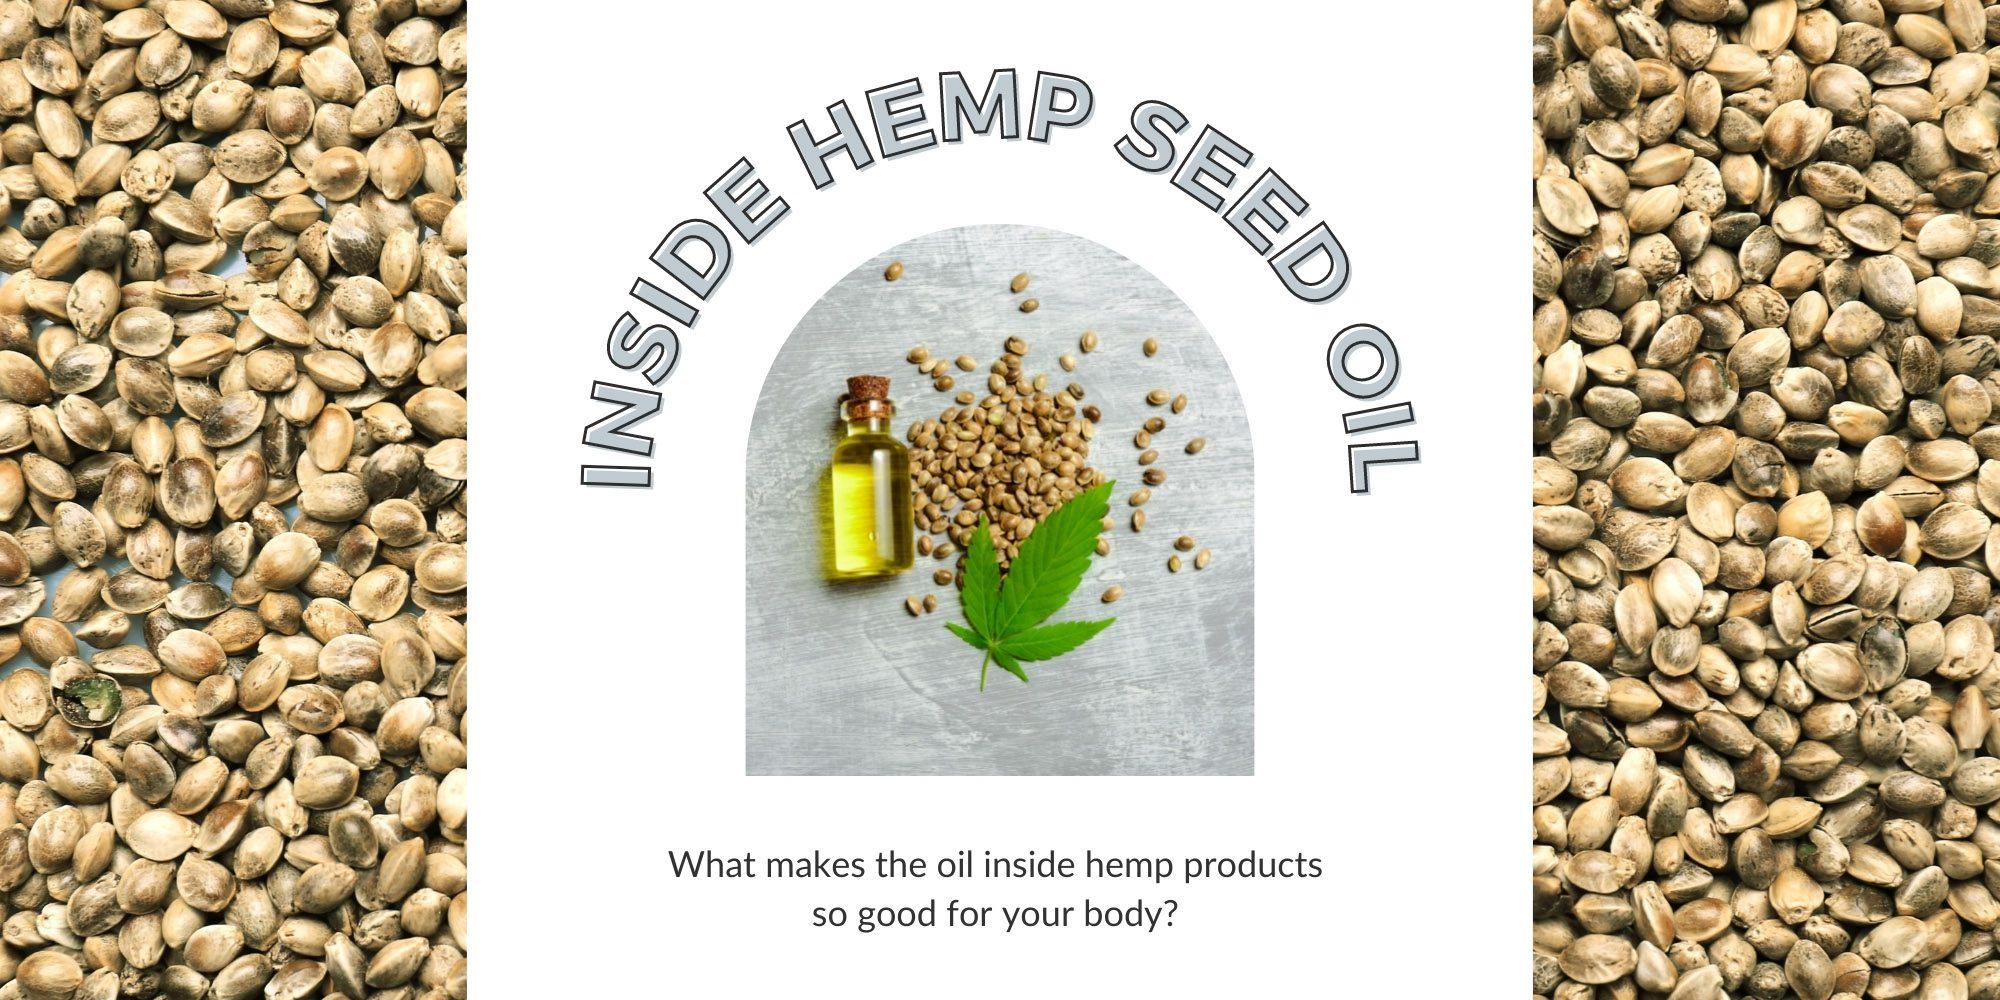 Inside Hemp Seed Oil header